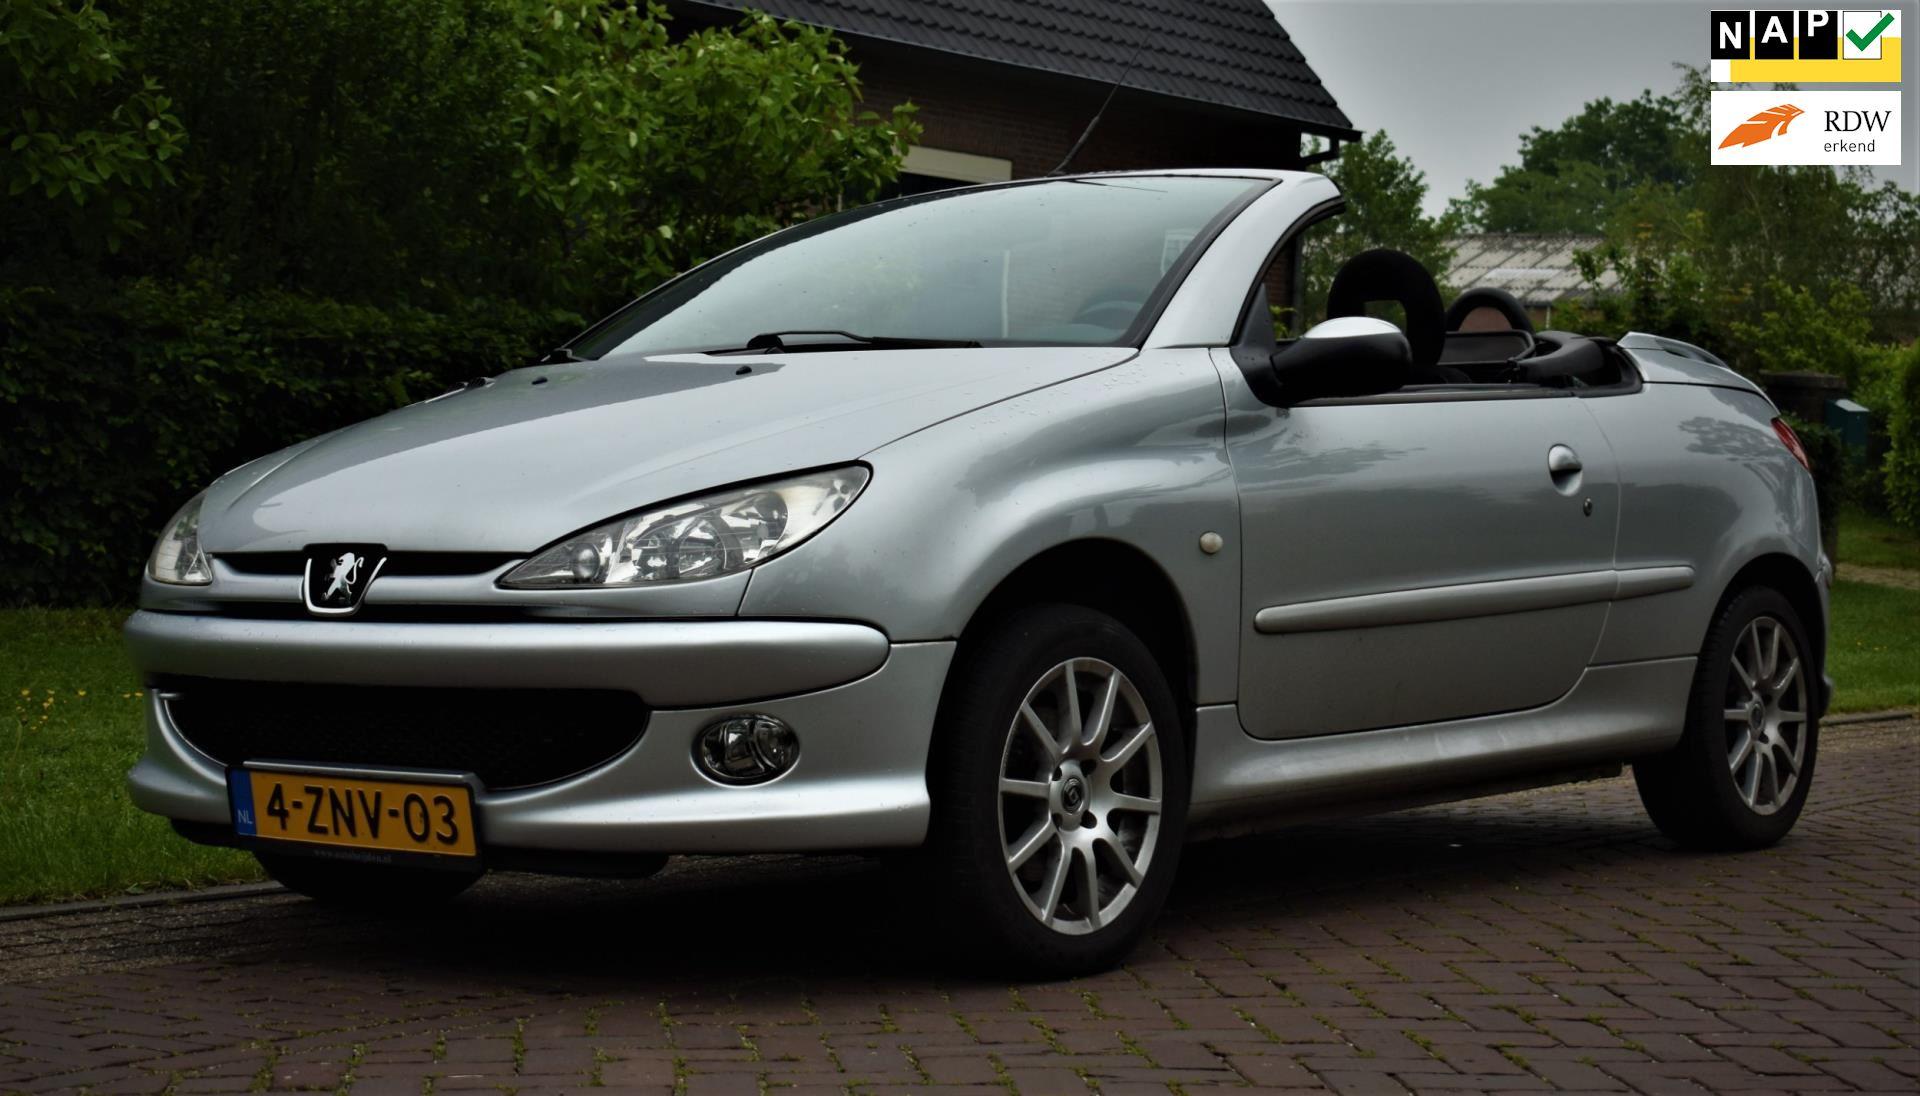 Peugeot 206 CC occasion - F. Klomp Auto's